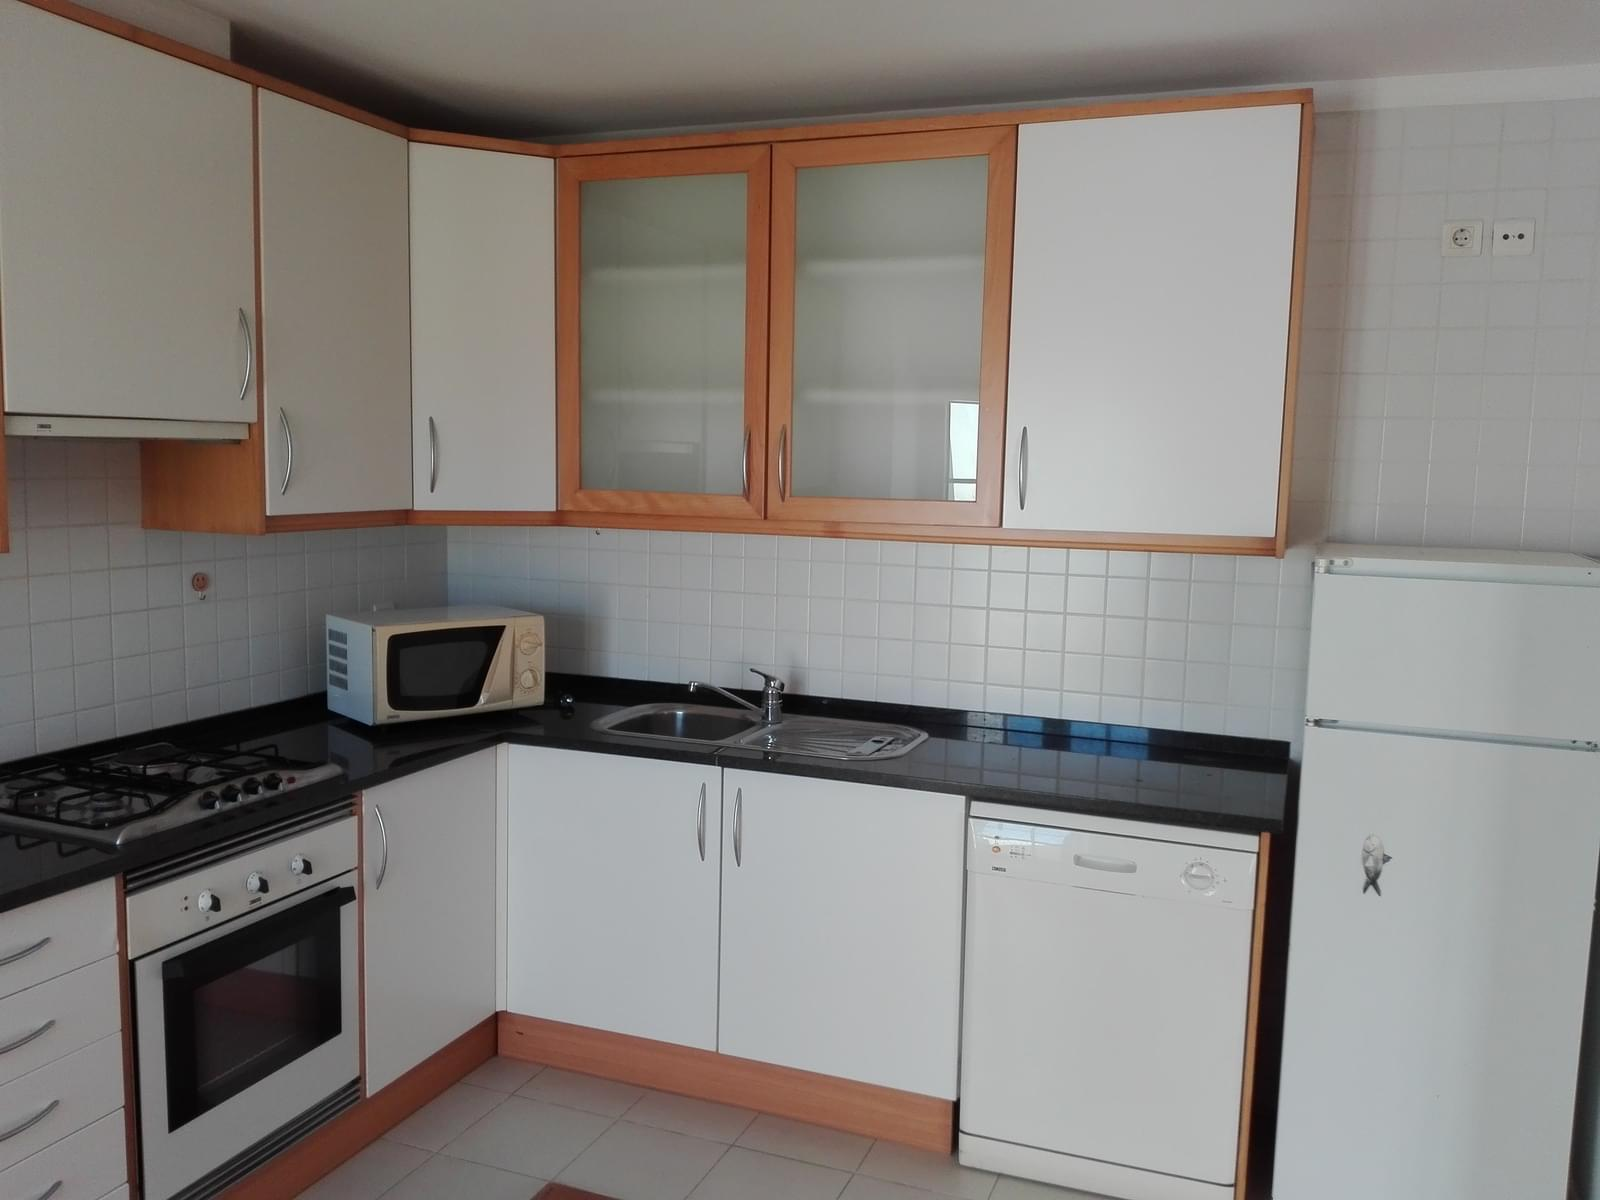 pf17908-apartamento-t1-lisboa-28a6a2d8-8627-41a5-9b34-8043b7e0e08f